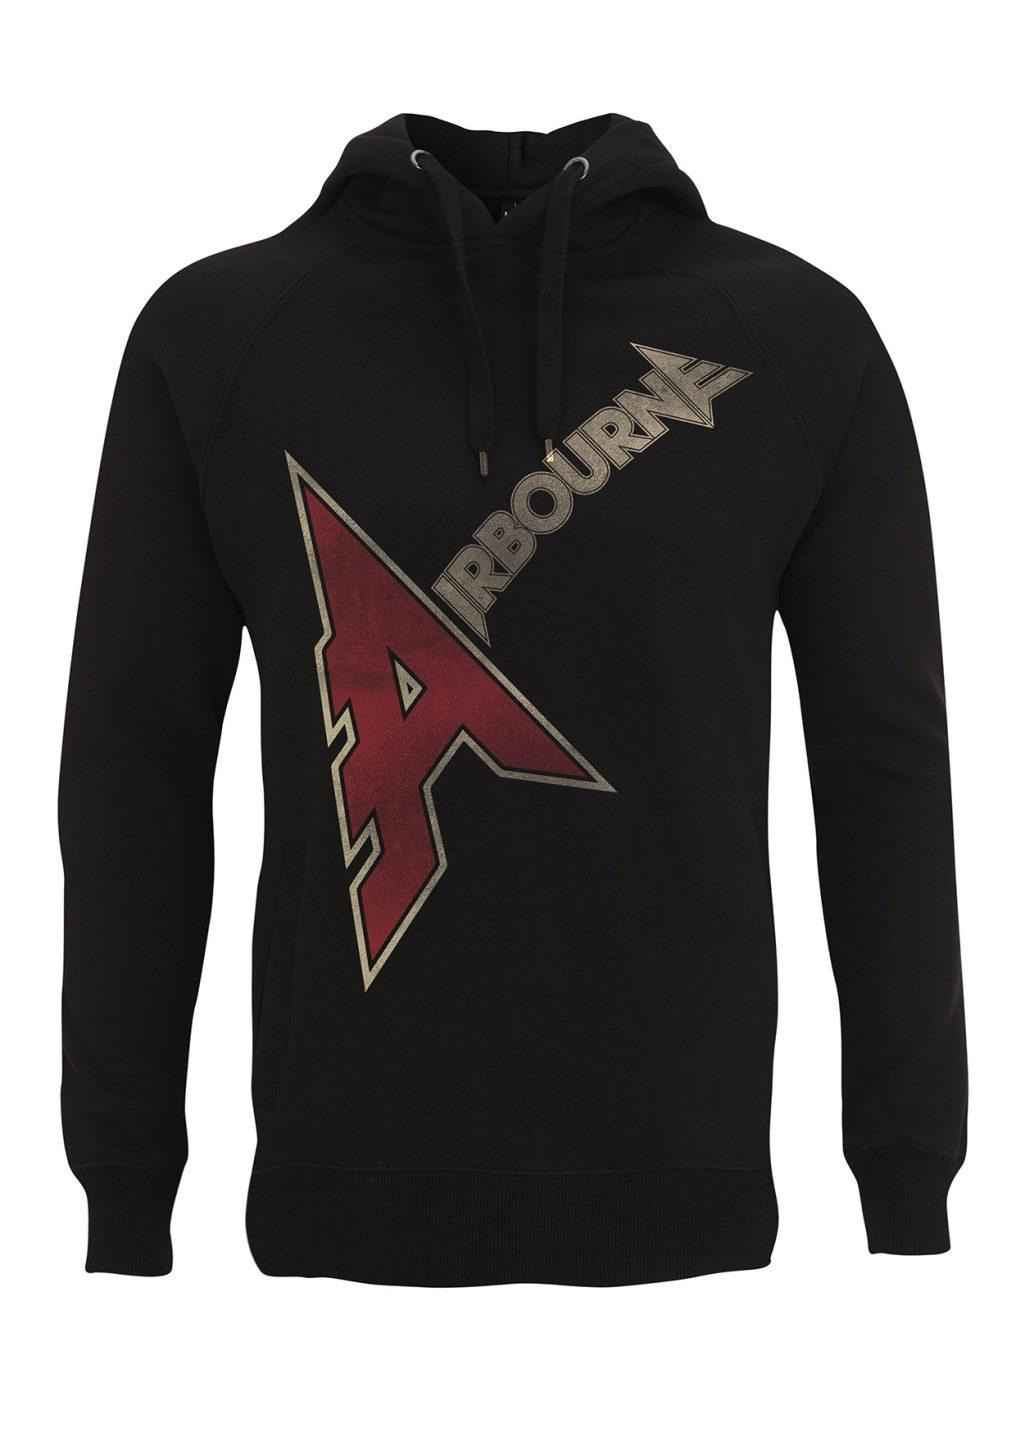 rtairhdbalo-airbourne-a-logo-black-pullover-hood